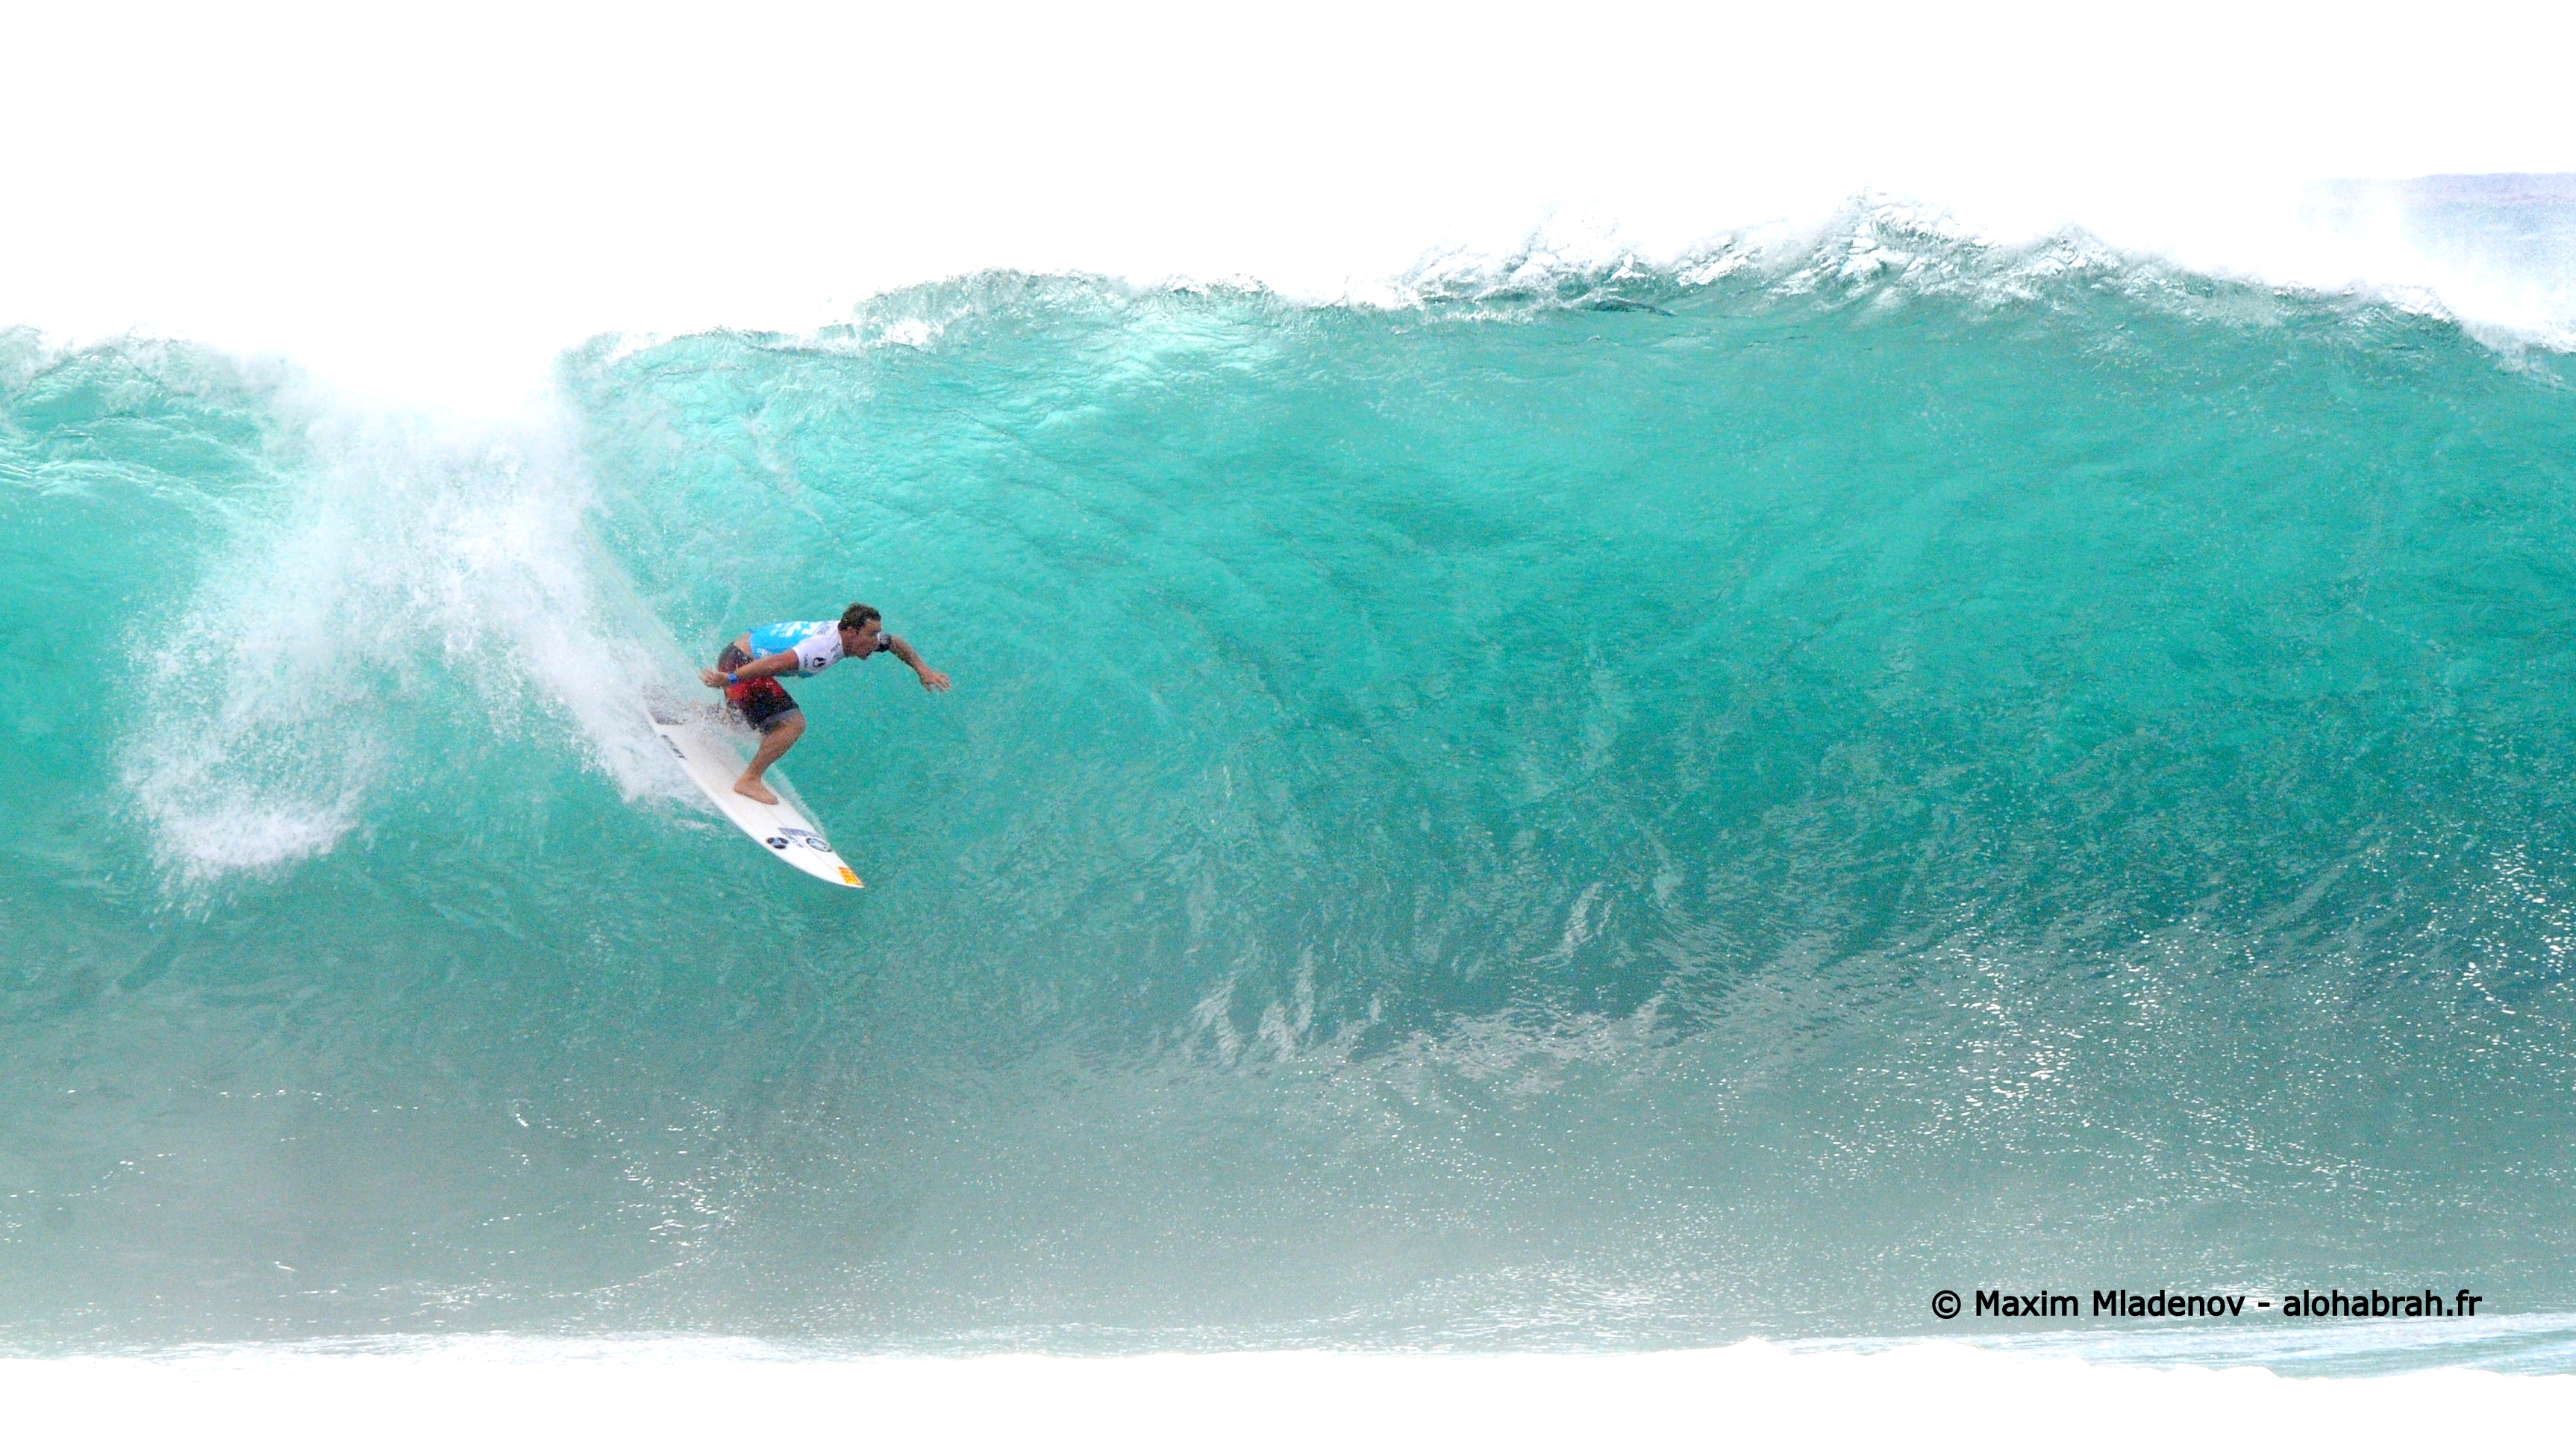 Magical effect by Kalani Chapman (Haw) - Round 5 du Pipe Masters 2011 © Maxim Mladenov - alohabrah.fr